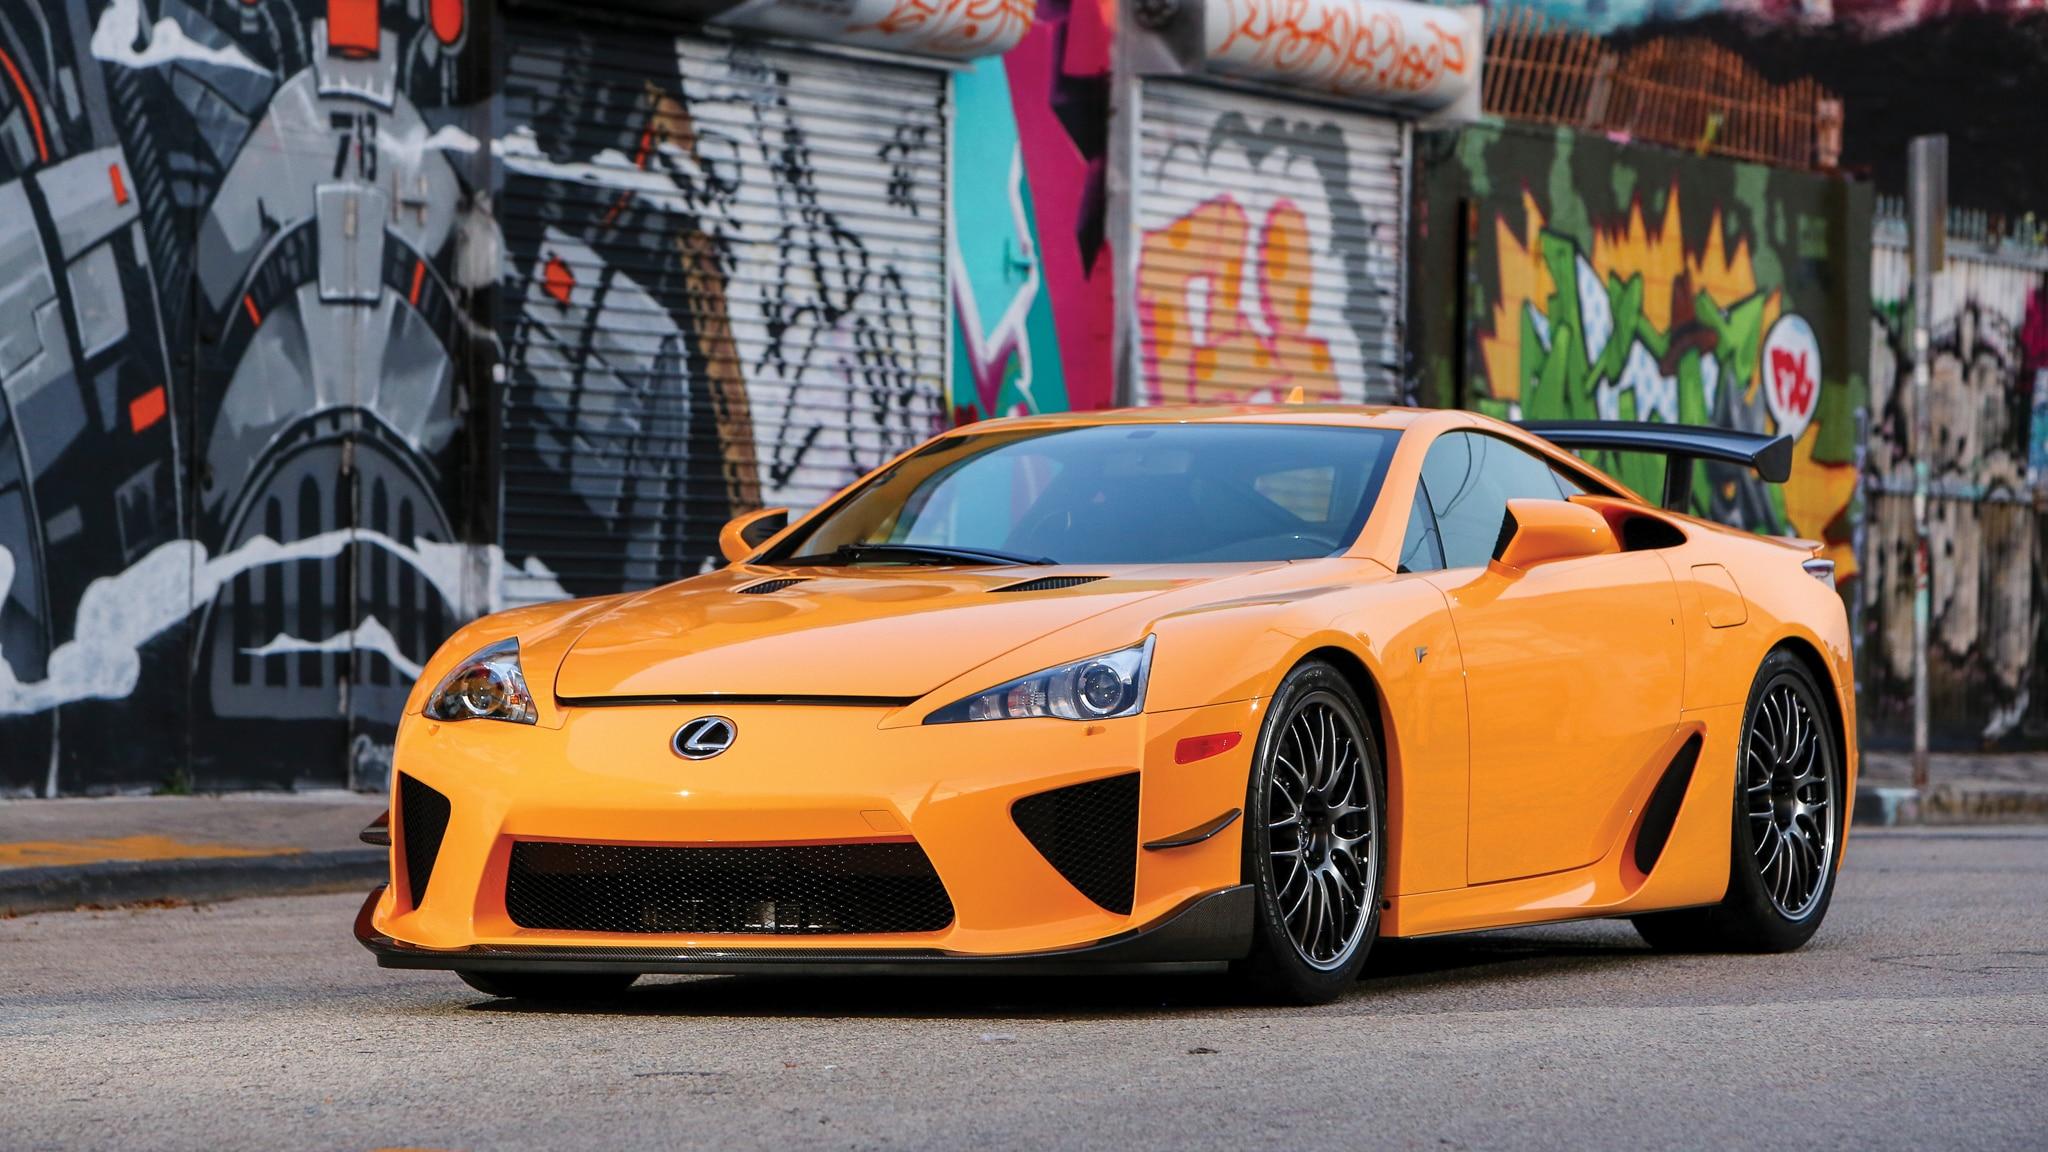 Lexus Lfa Price Market Watch History Models Specs And More